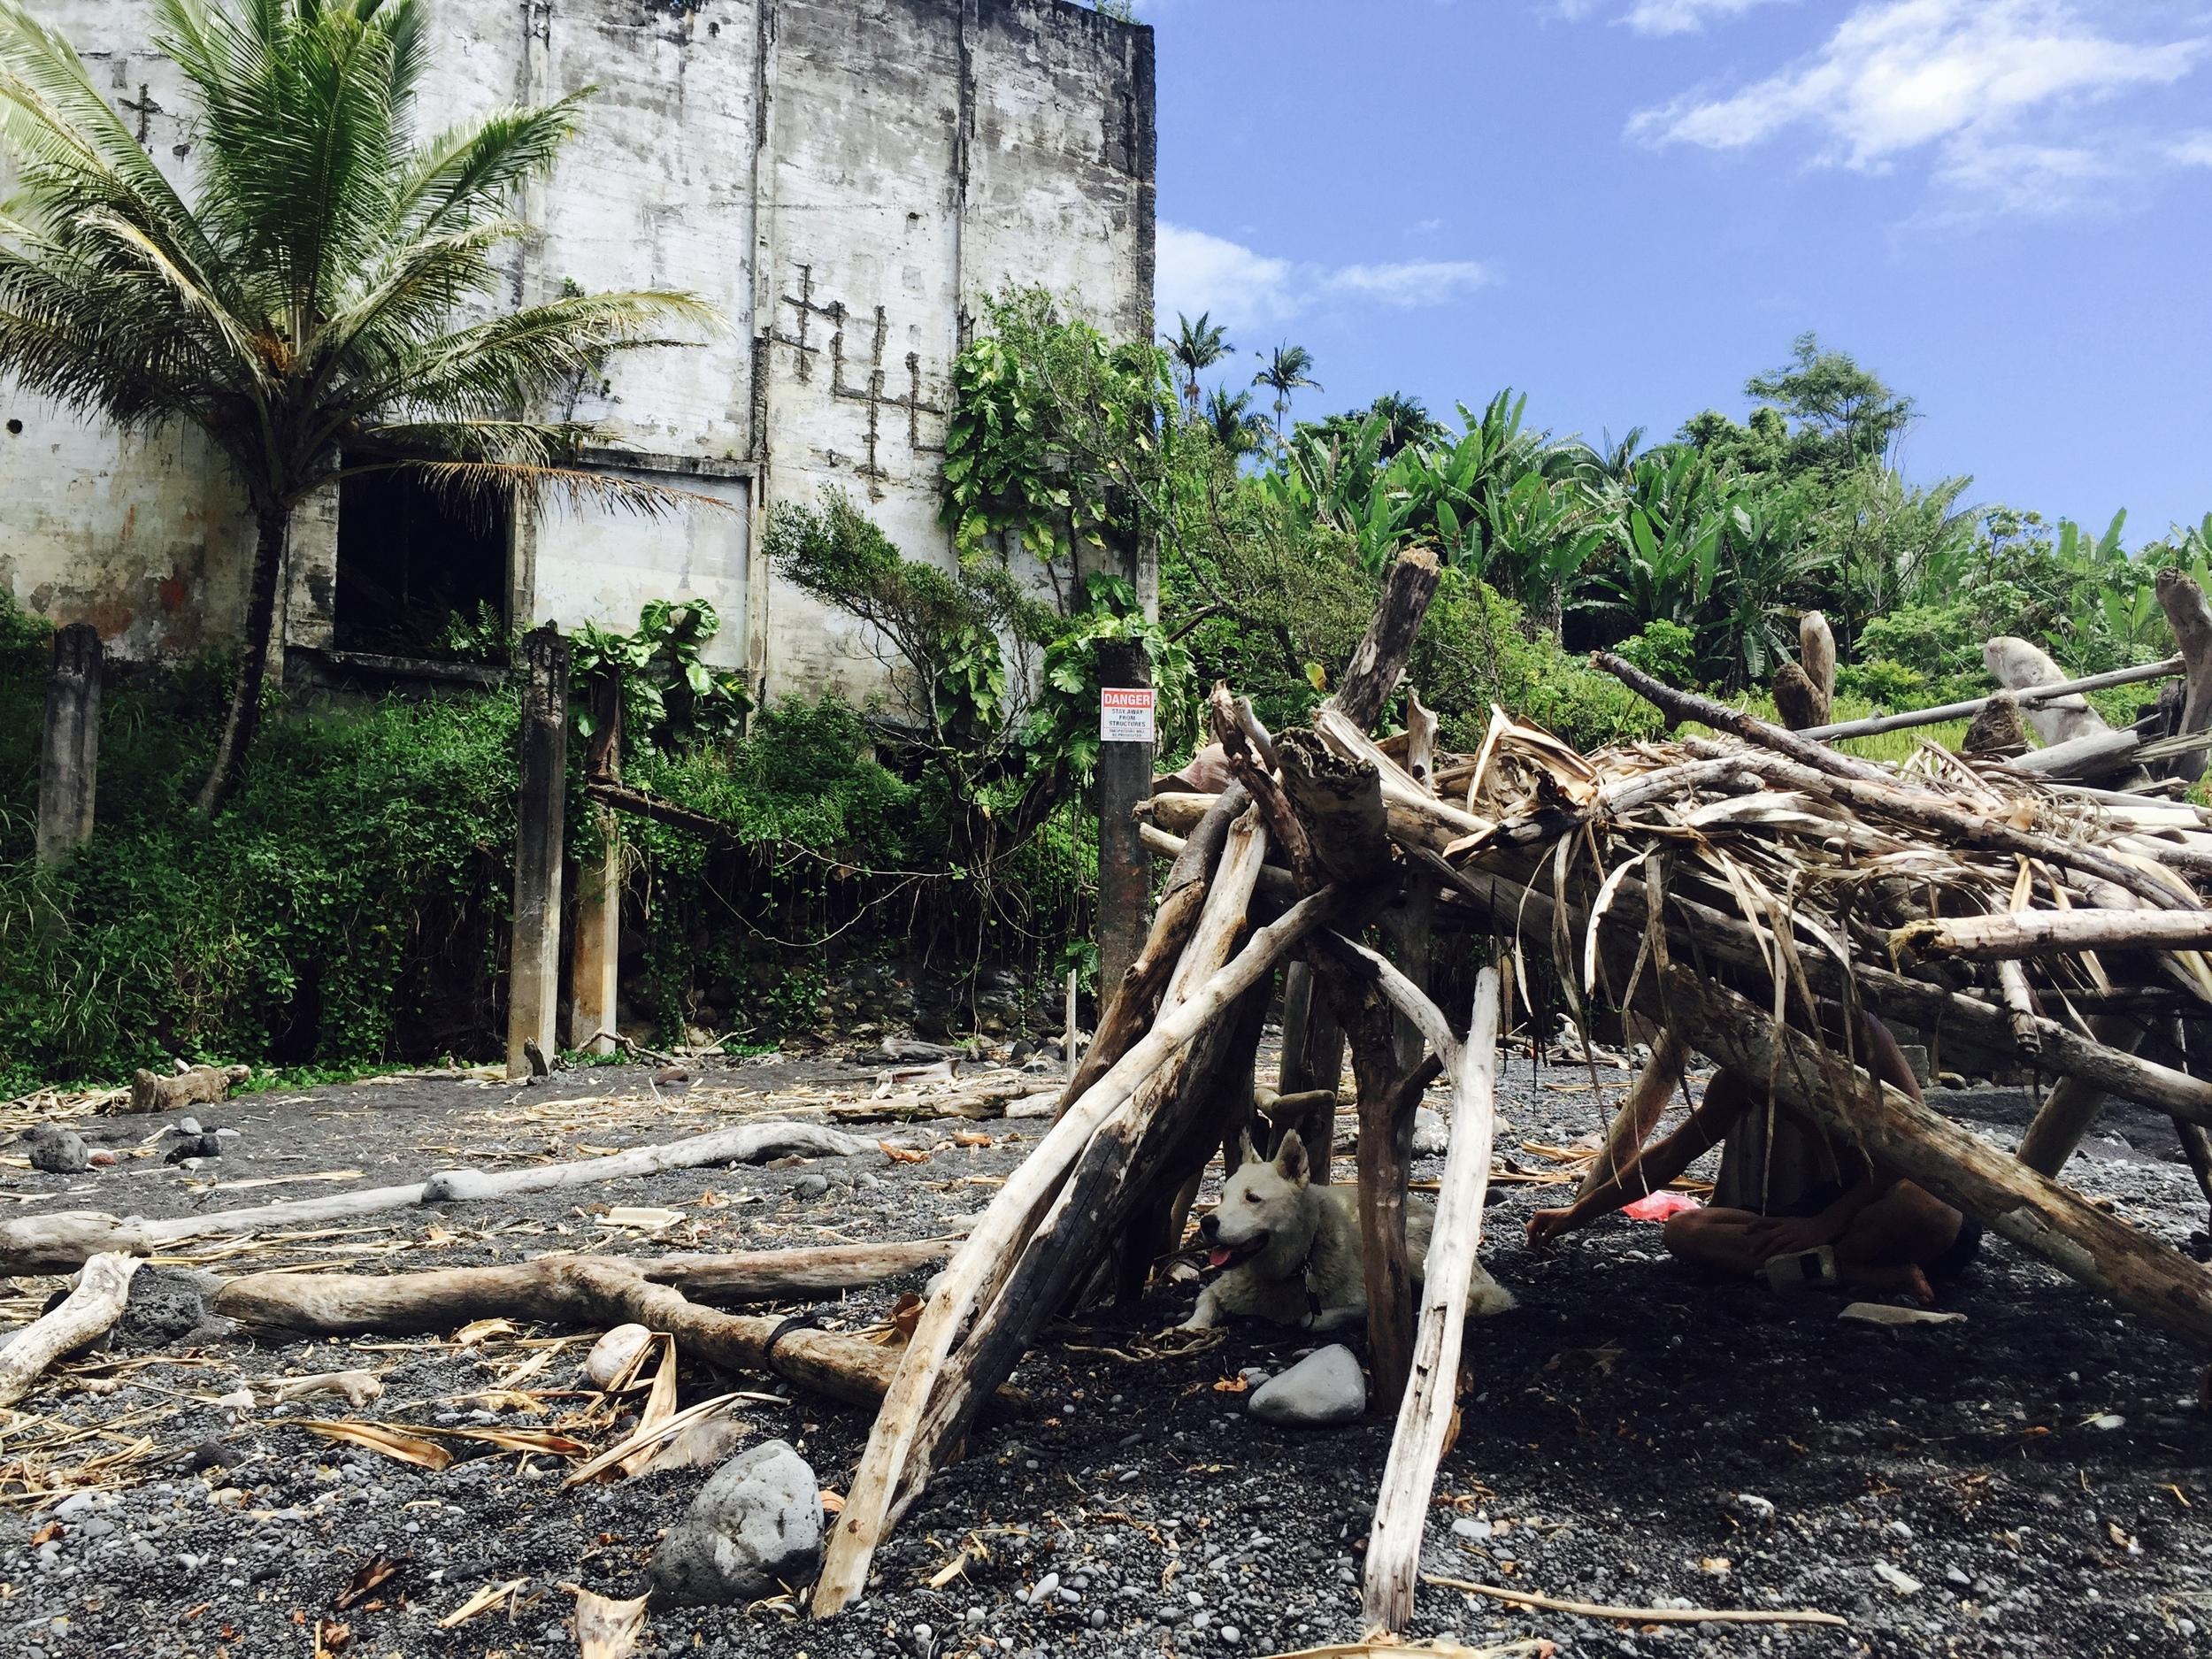 Abandoned Sugar Mill on the Hamakua Coast